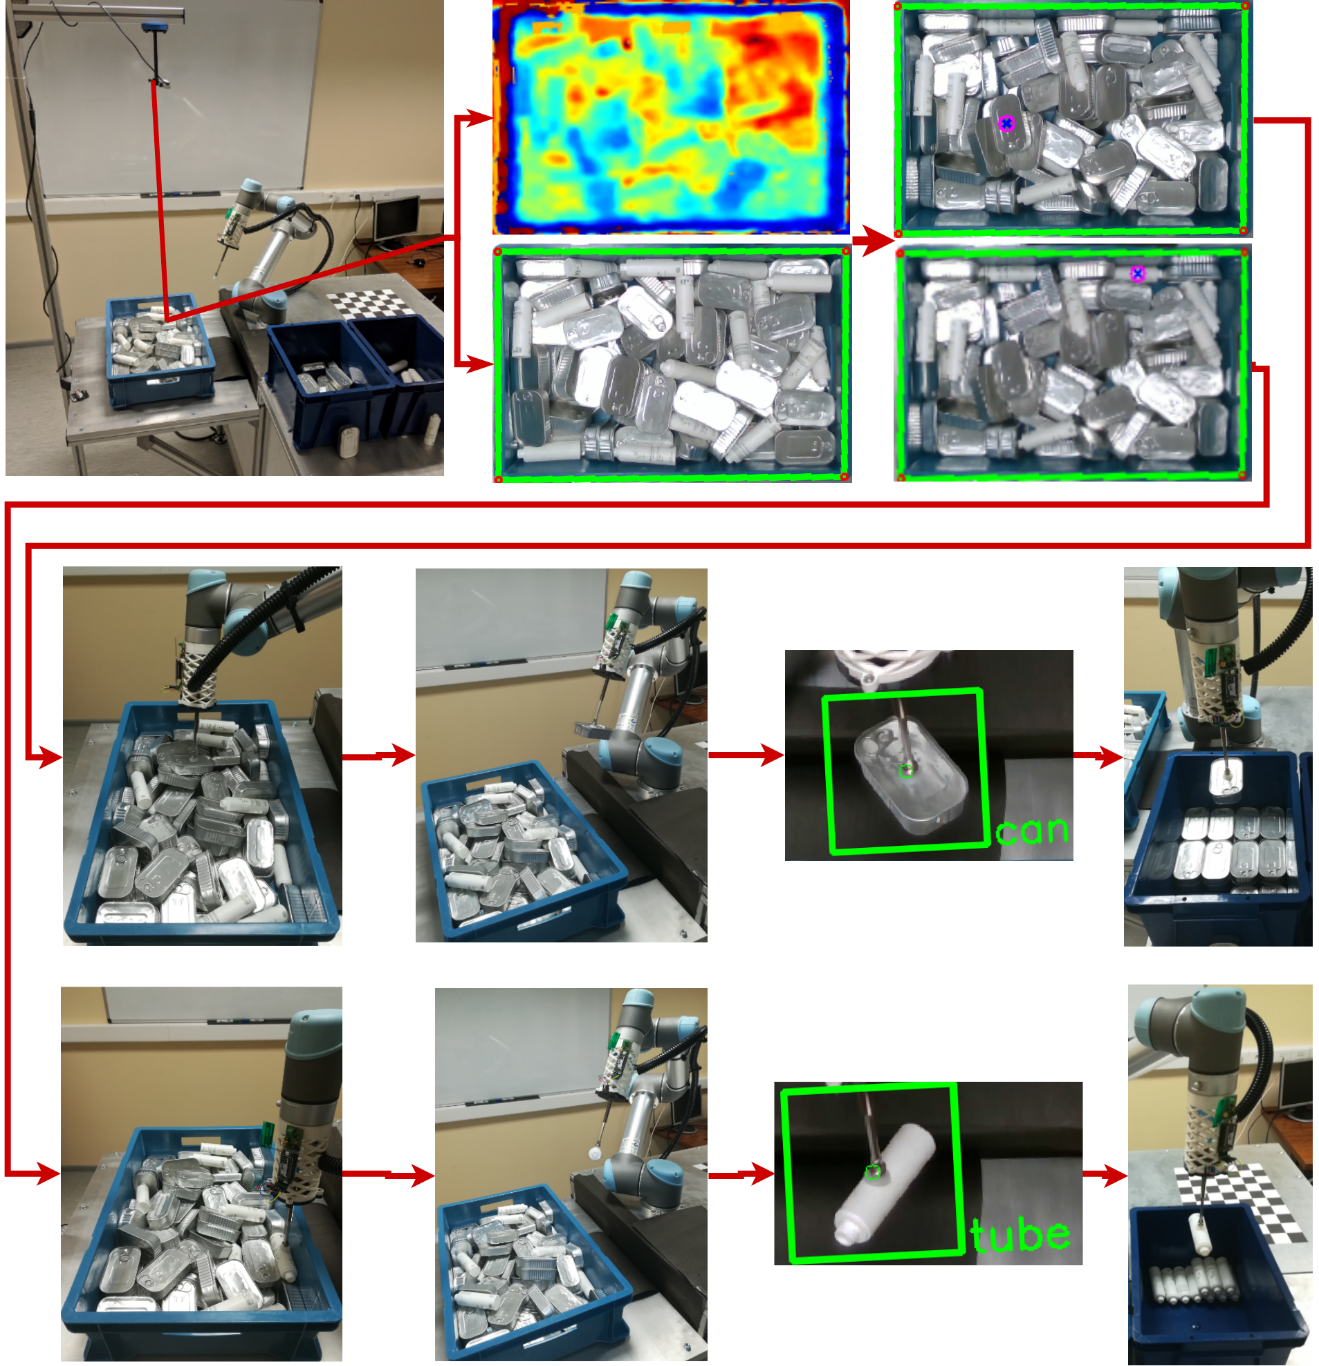 Robot Control for bin-picking